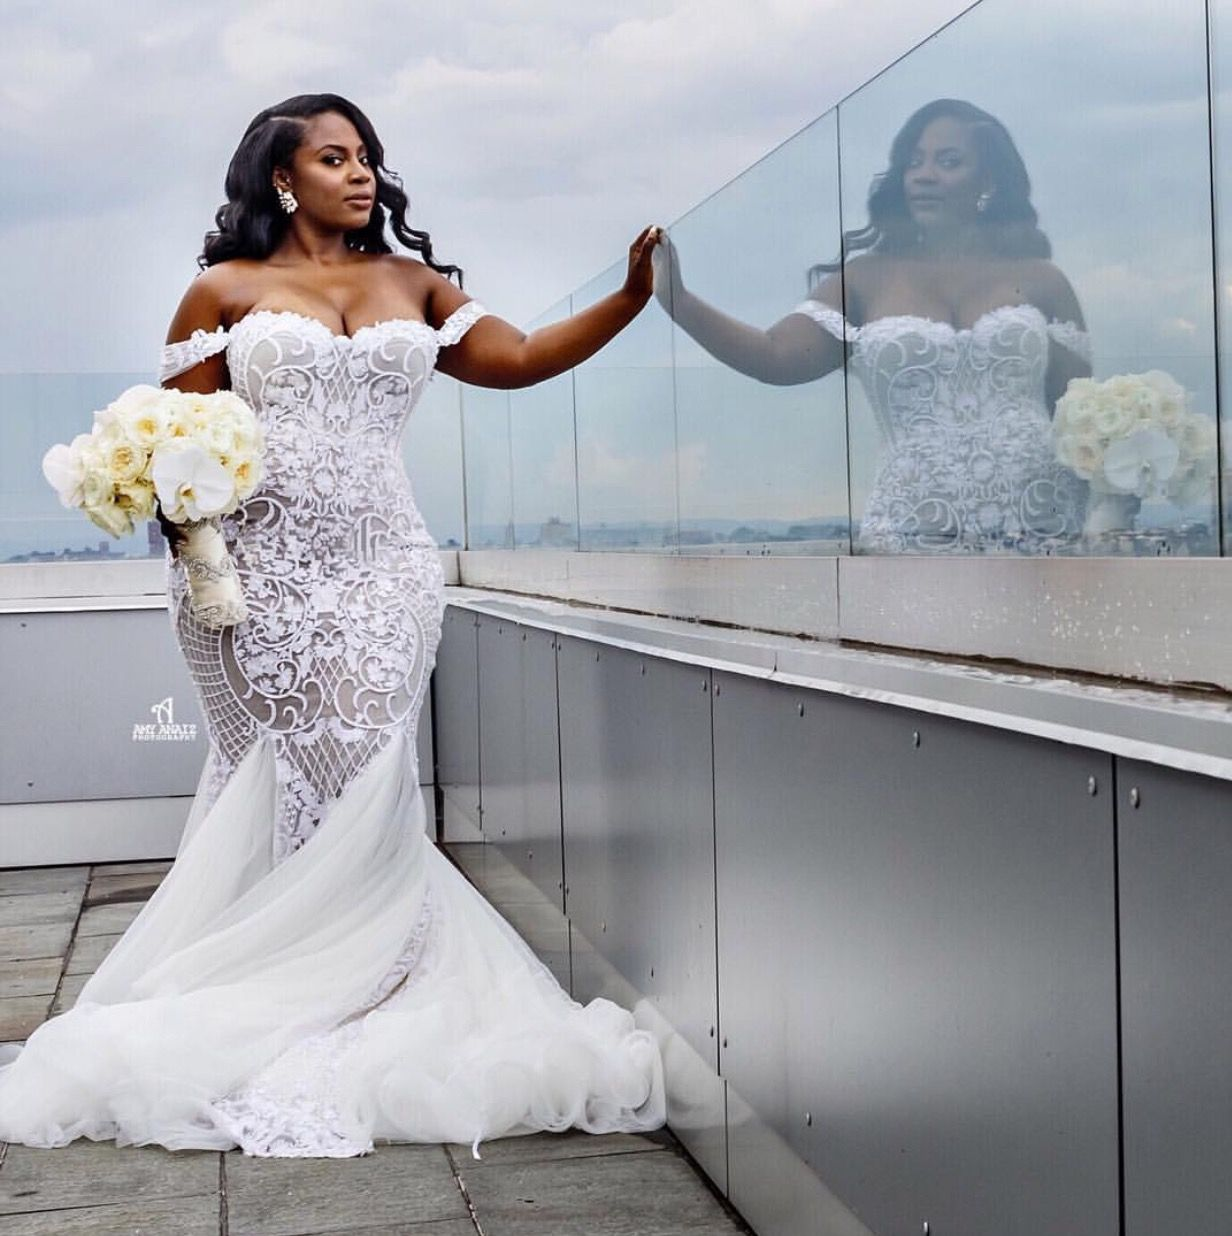 Pin de Sydney M. Hunley 👸🏾✨ en Wedding Dreams ✨ | Pinterest ...